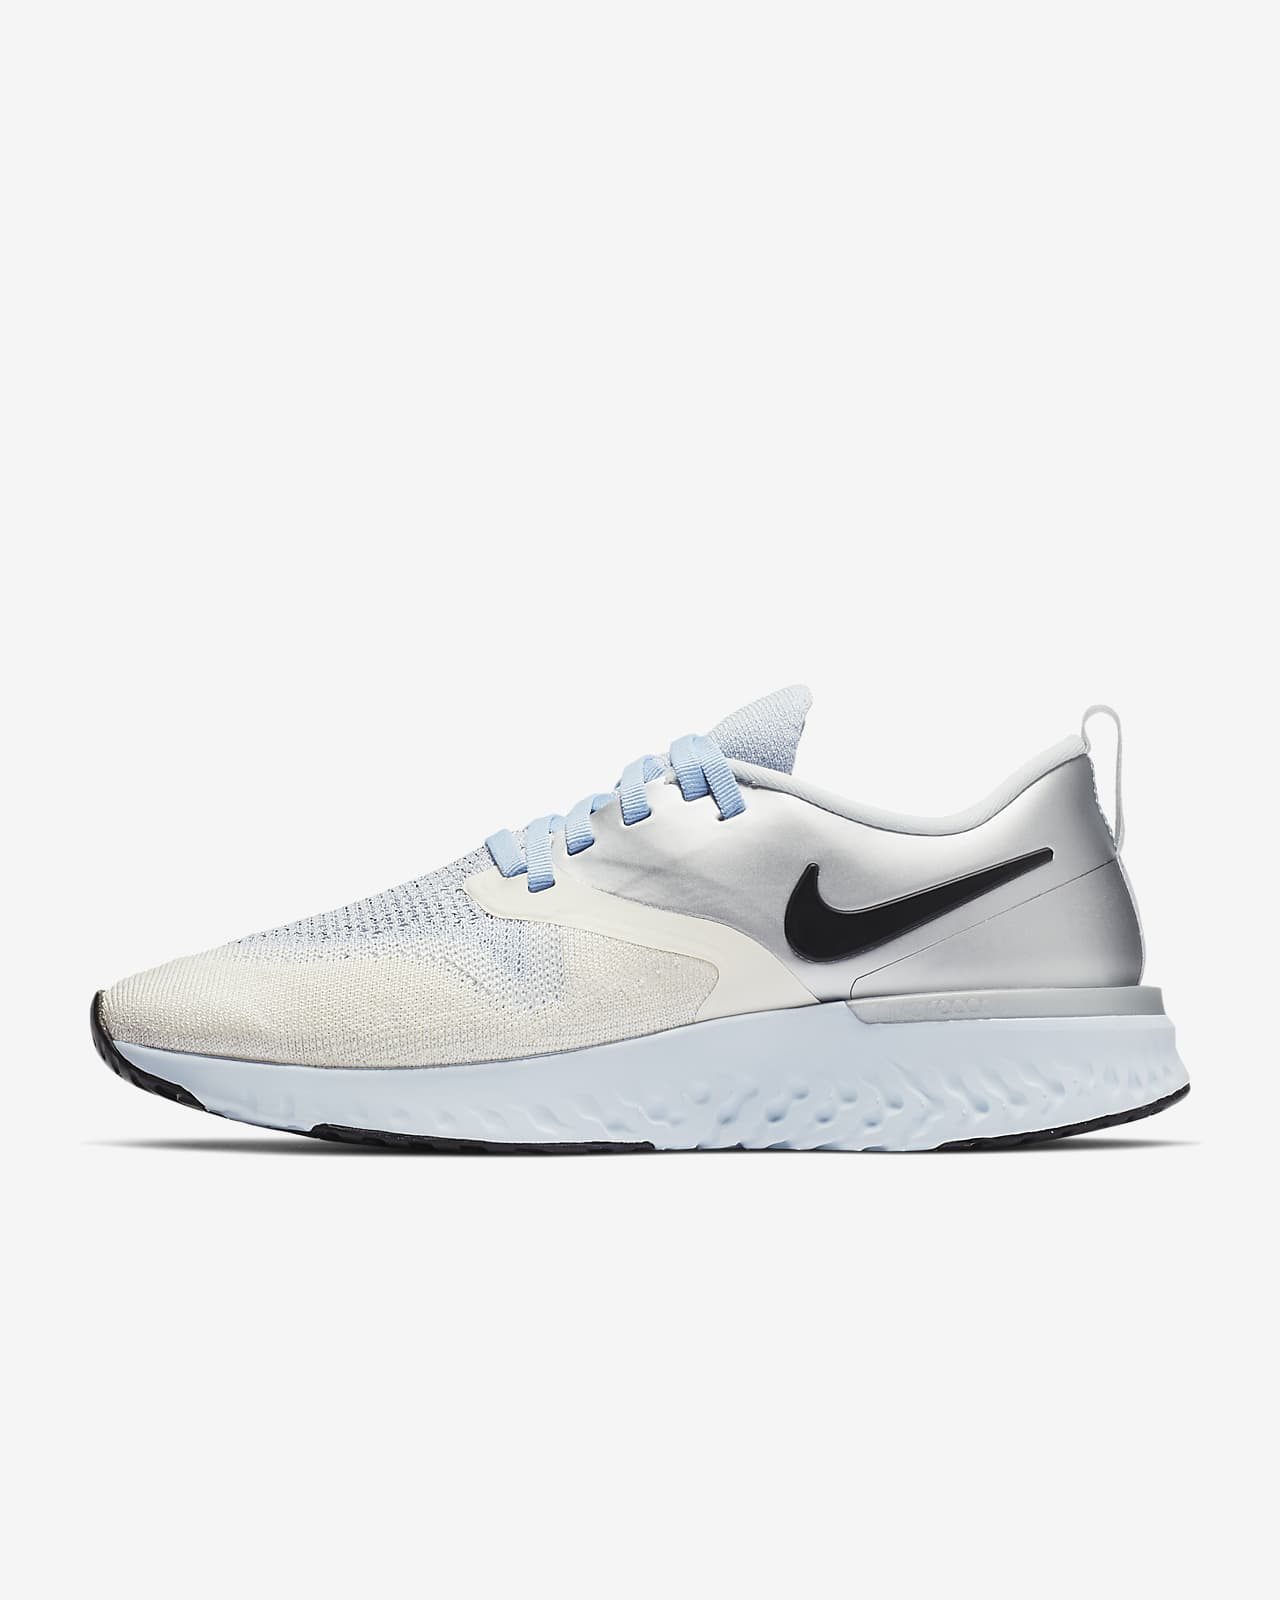 Black Nike Womens Odyssey React Flyknit 2 Running Shoe Size 7.0